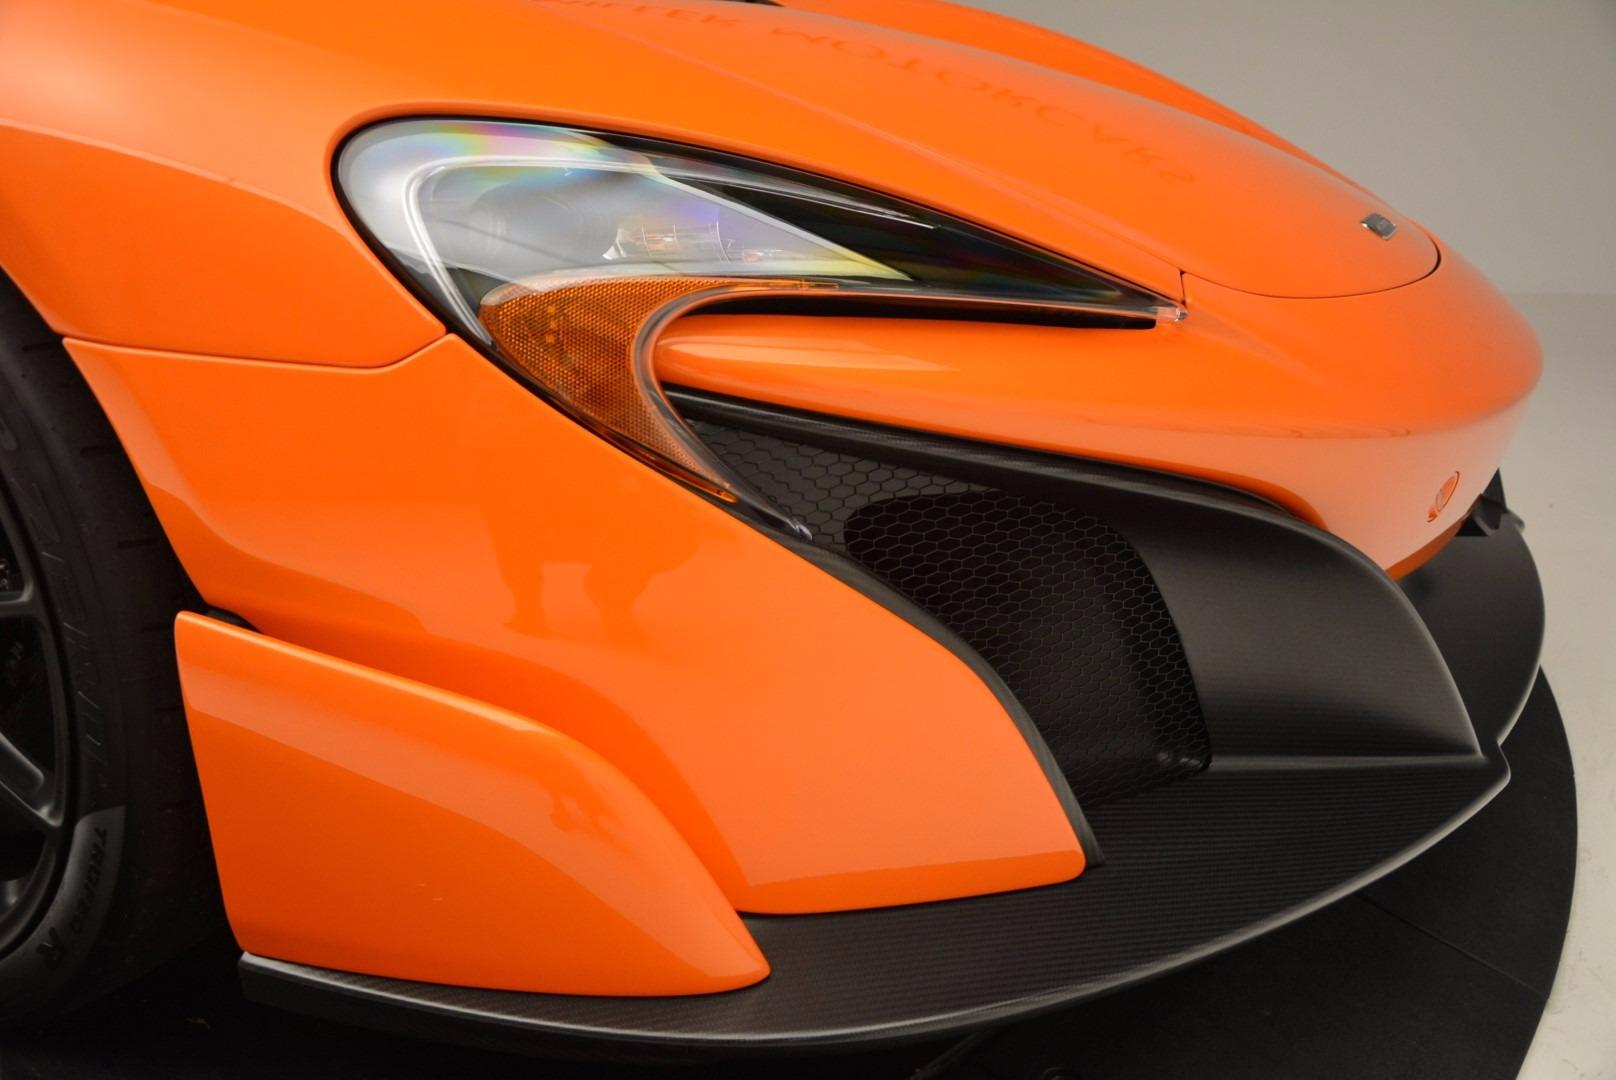 Used 2016 McLaren 675LT Spider Convertible | Greenwich, CT